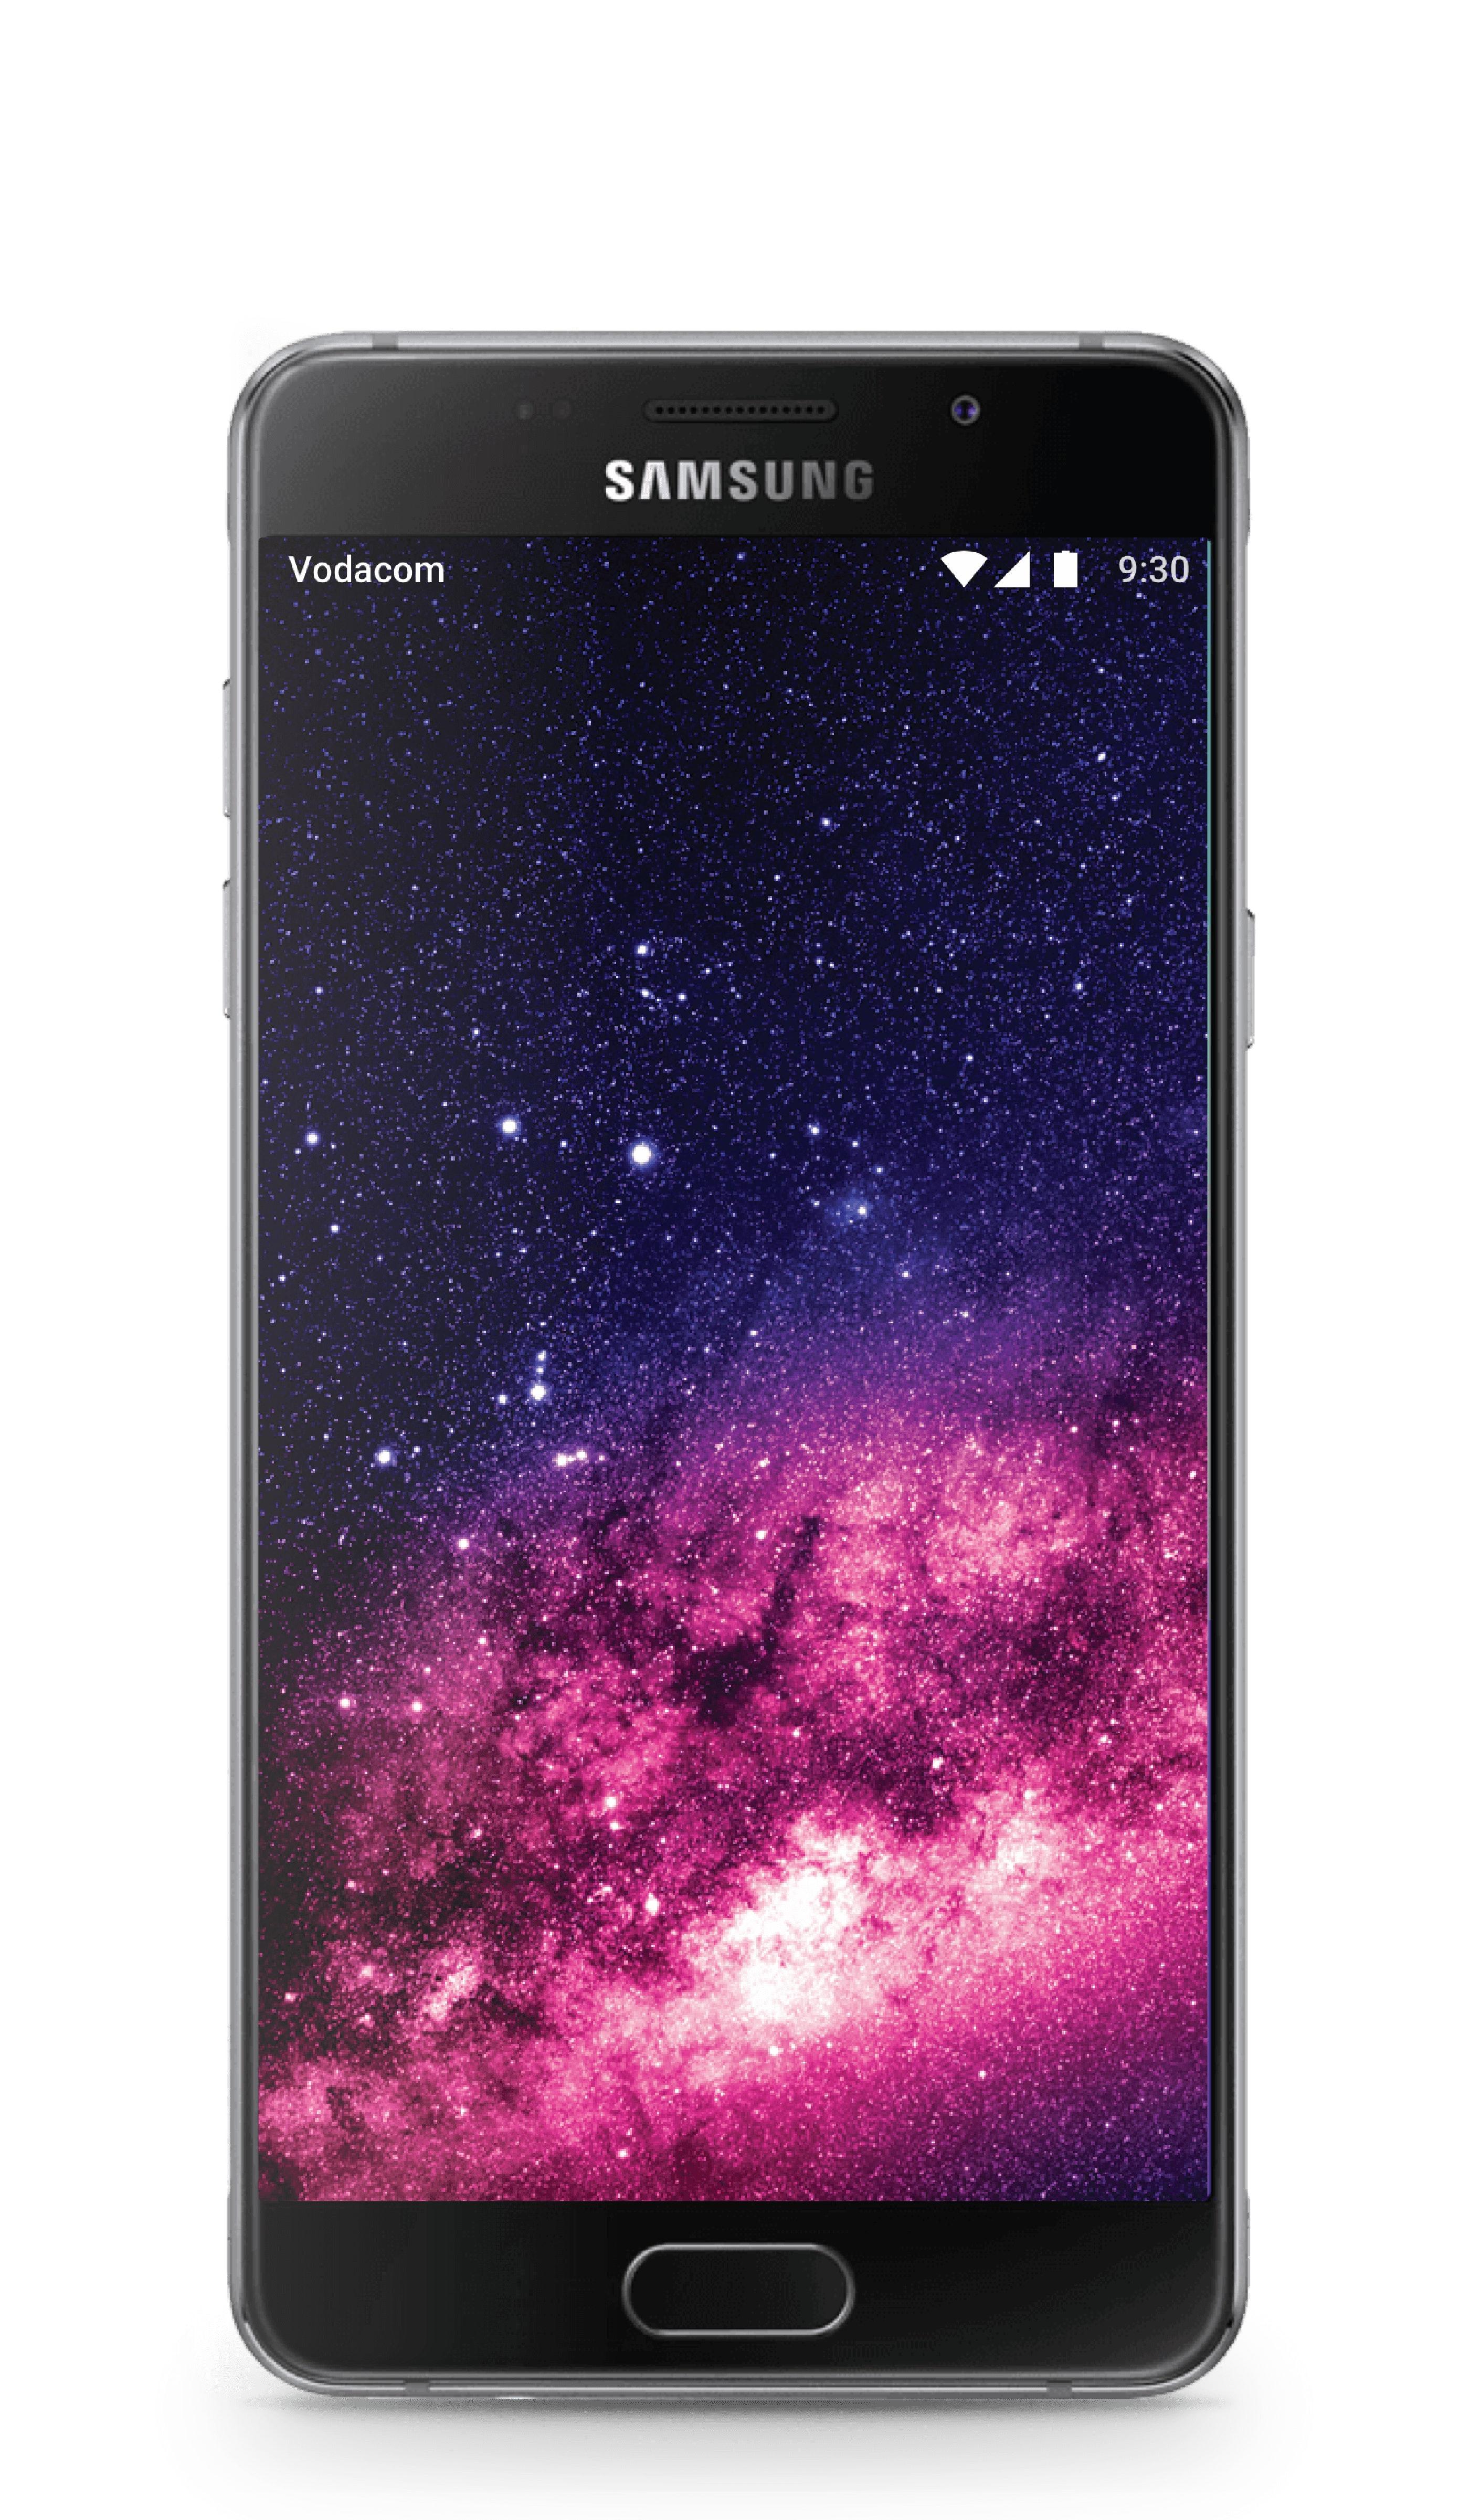 Samsung Galaxy A5 (2016) image